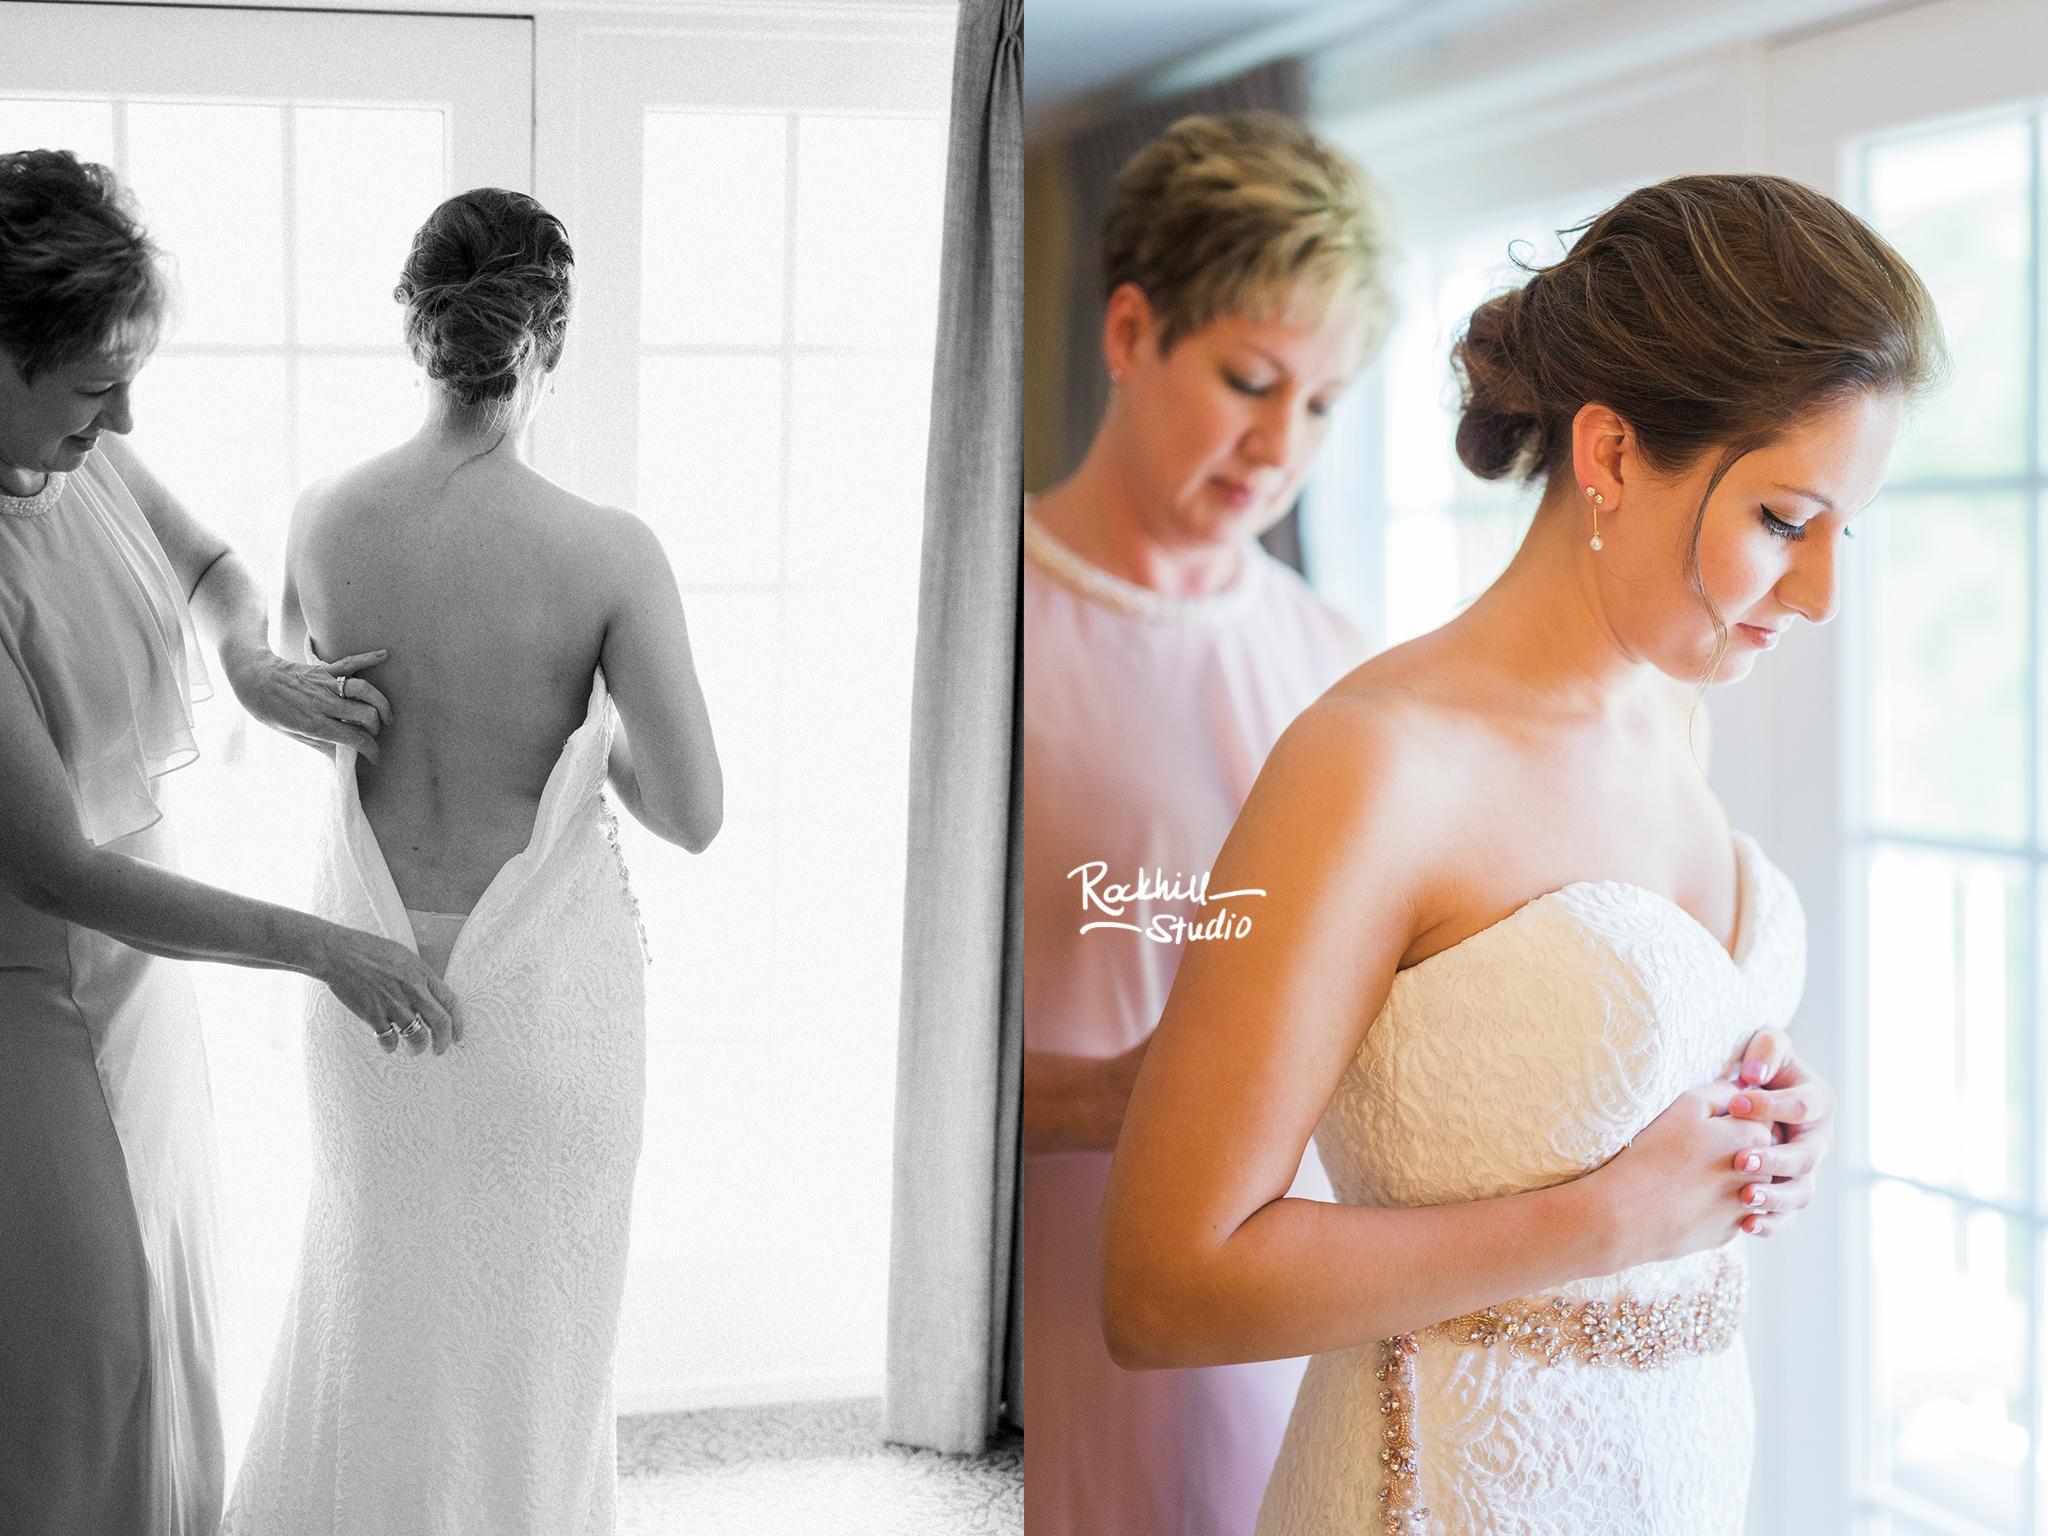 Mackinac Island Wedding, Traverse City wedding photographer Rockhill Studio, Inn at Stonecliffe, getting ready